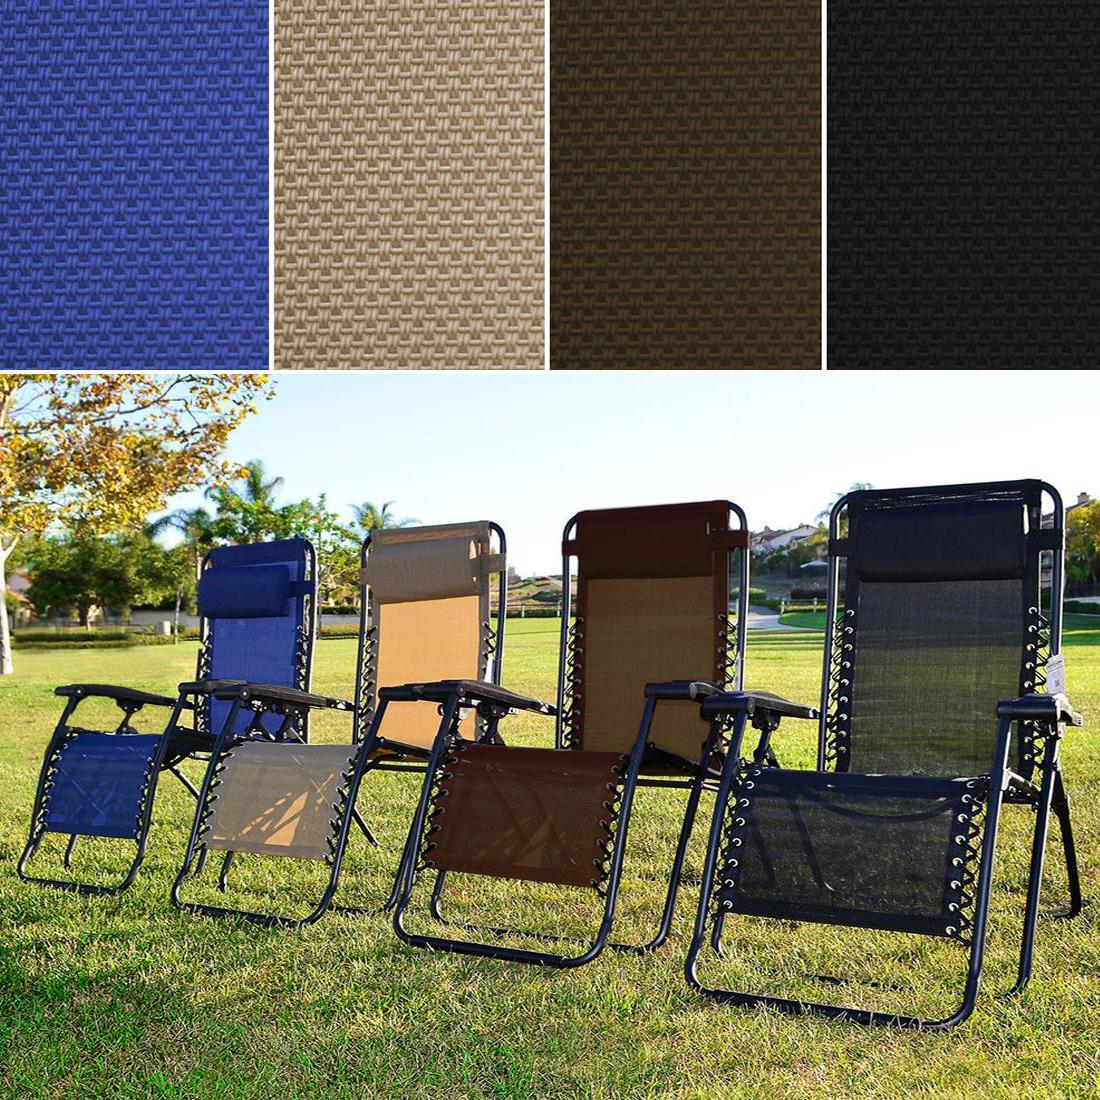 Lawn Chair 40 Oz: Amazon.com : Caravan Sports Infinity Oversized Zero